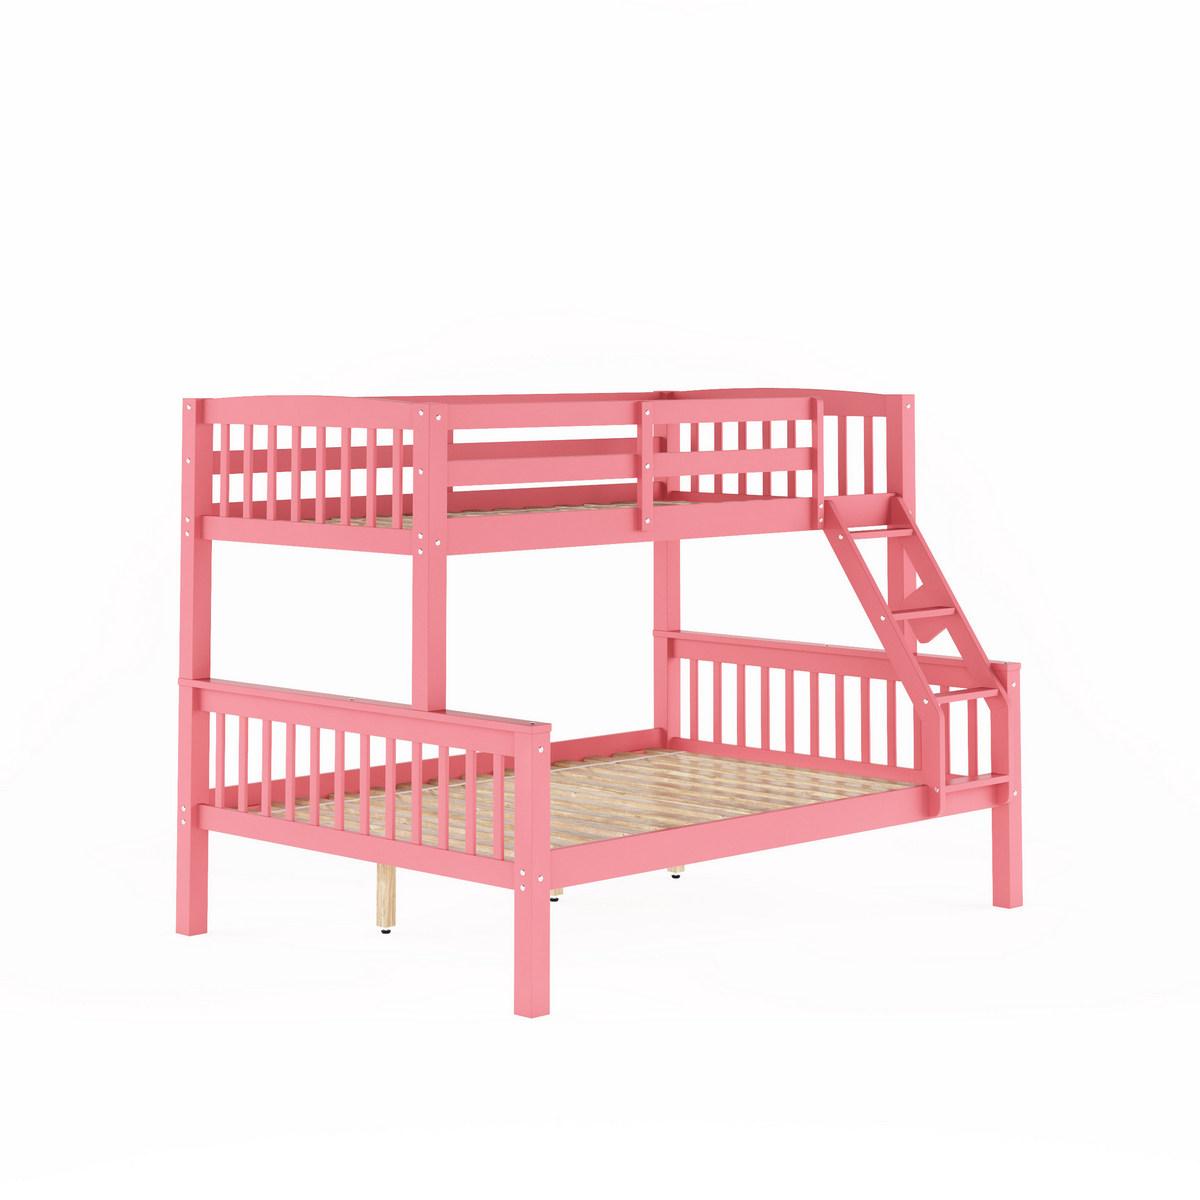 Corliving Bdn Dakota Pink Twin Single Over Full Double Bunk Bed